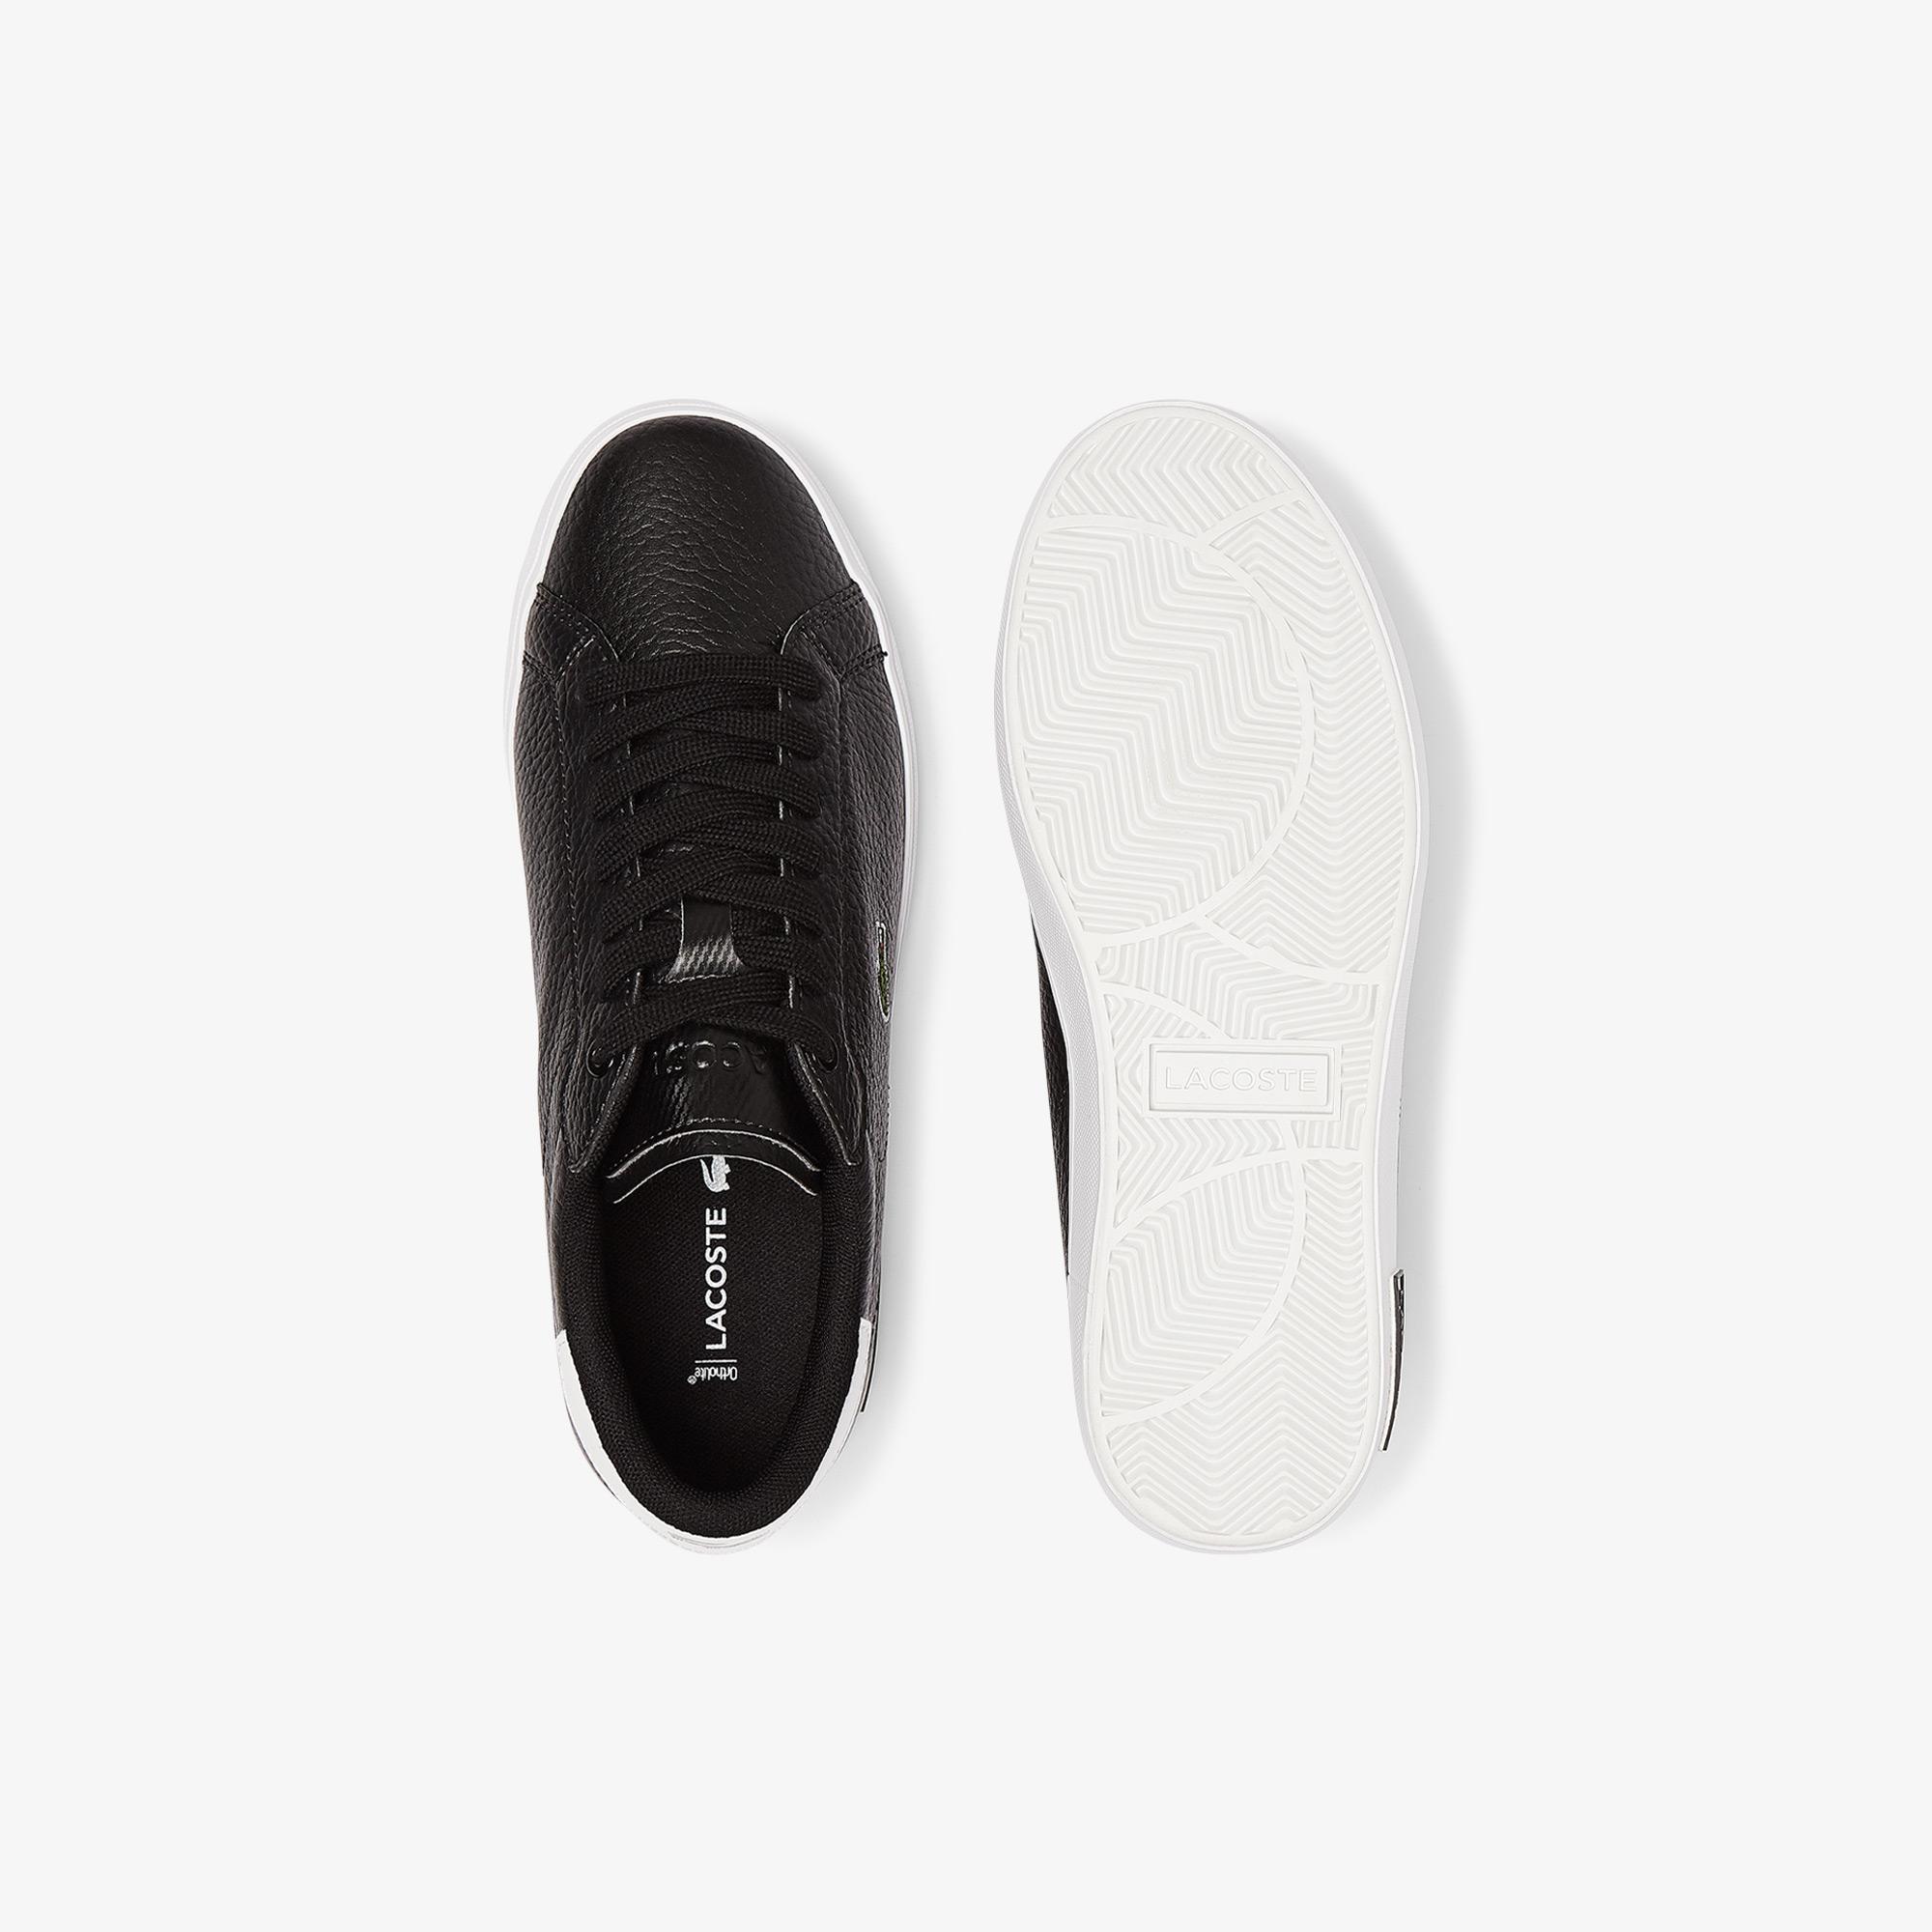 Lacoste Powercourt 0721 2 Sfa Kadın Siyah Sneaker